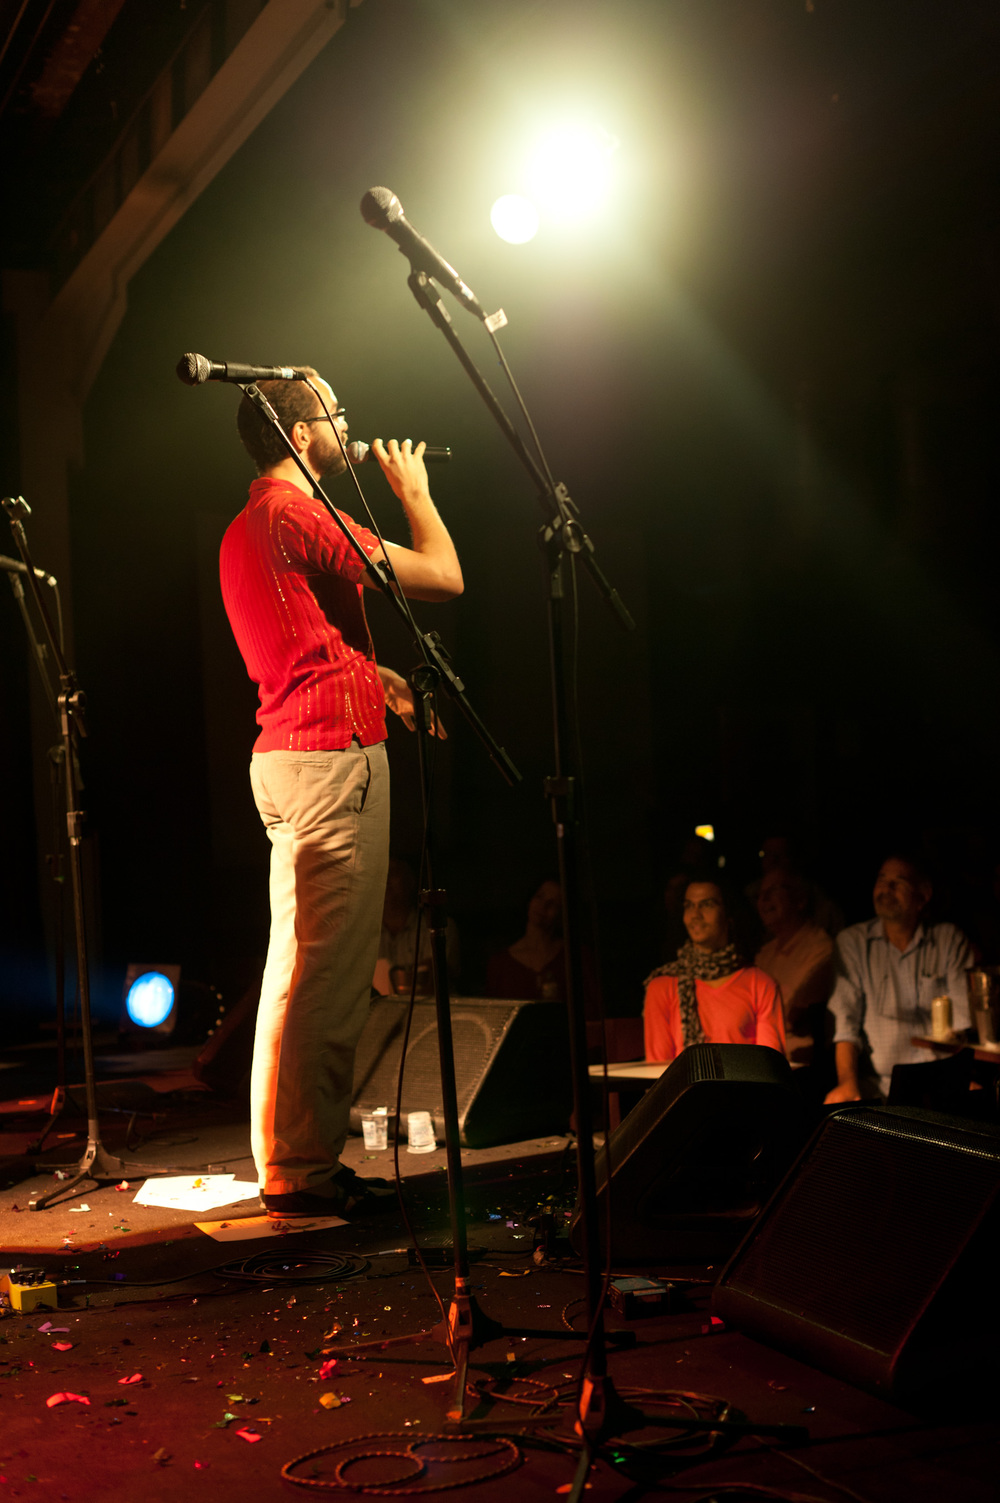 No lançamento do CD Claroescuro - Teatro Rival. Foto de Camilo Lobo